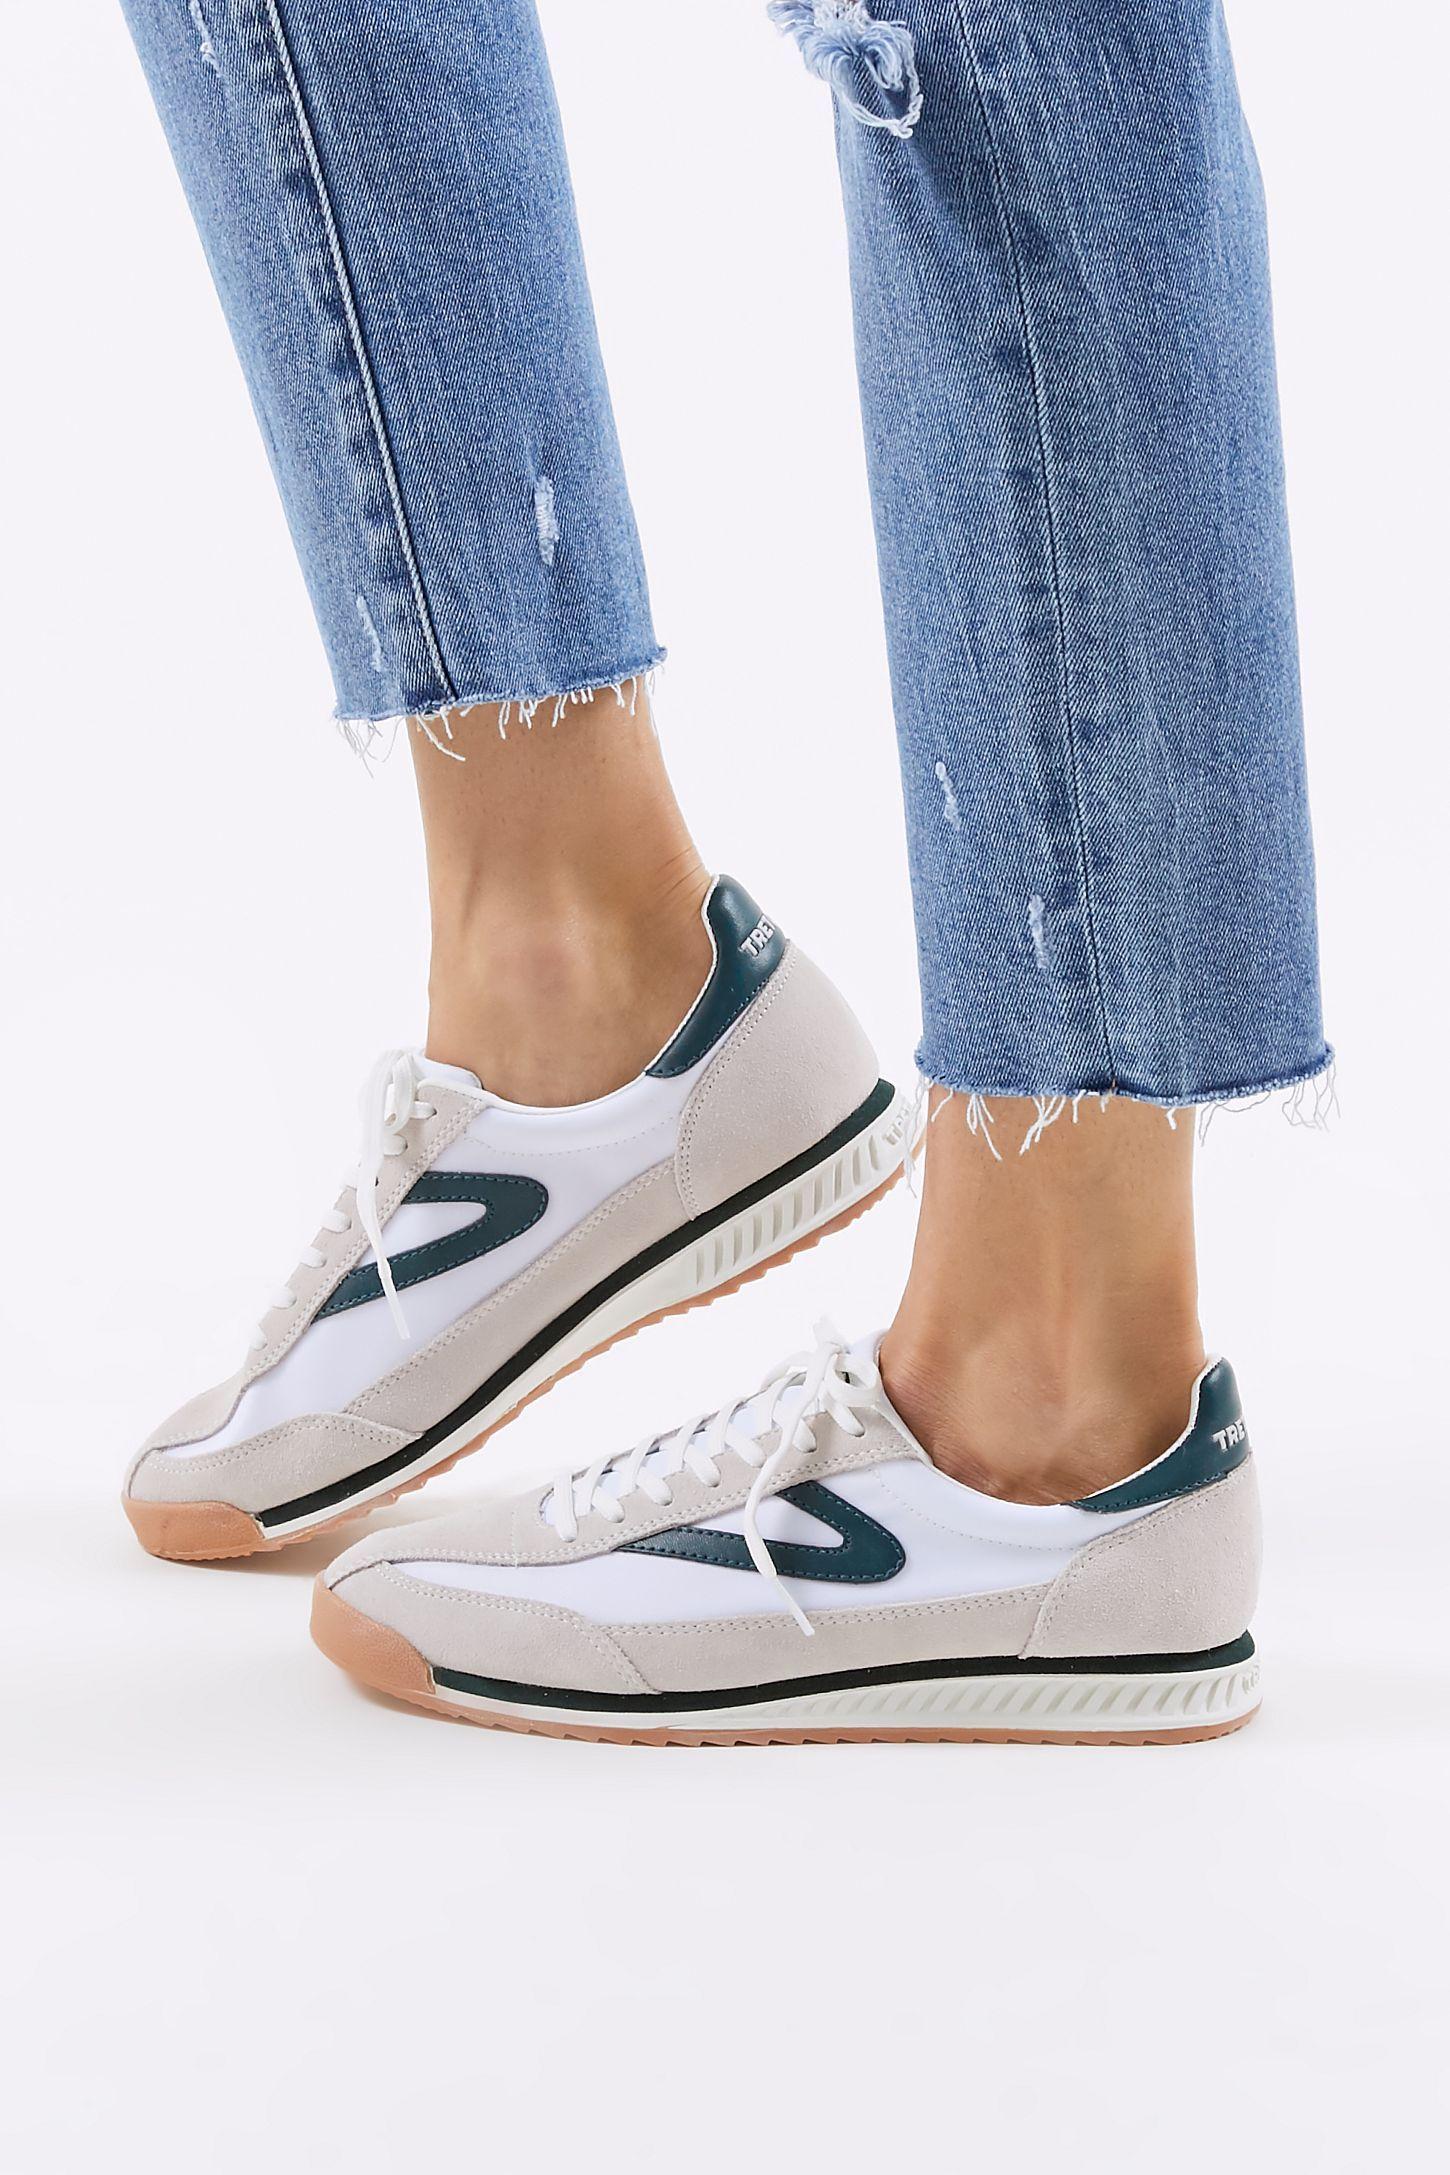 Sneakers, Tretorn sneakers, Fashion joggers